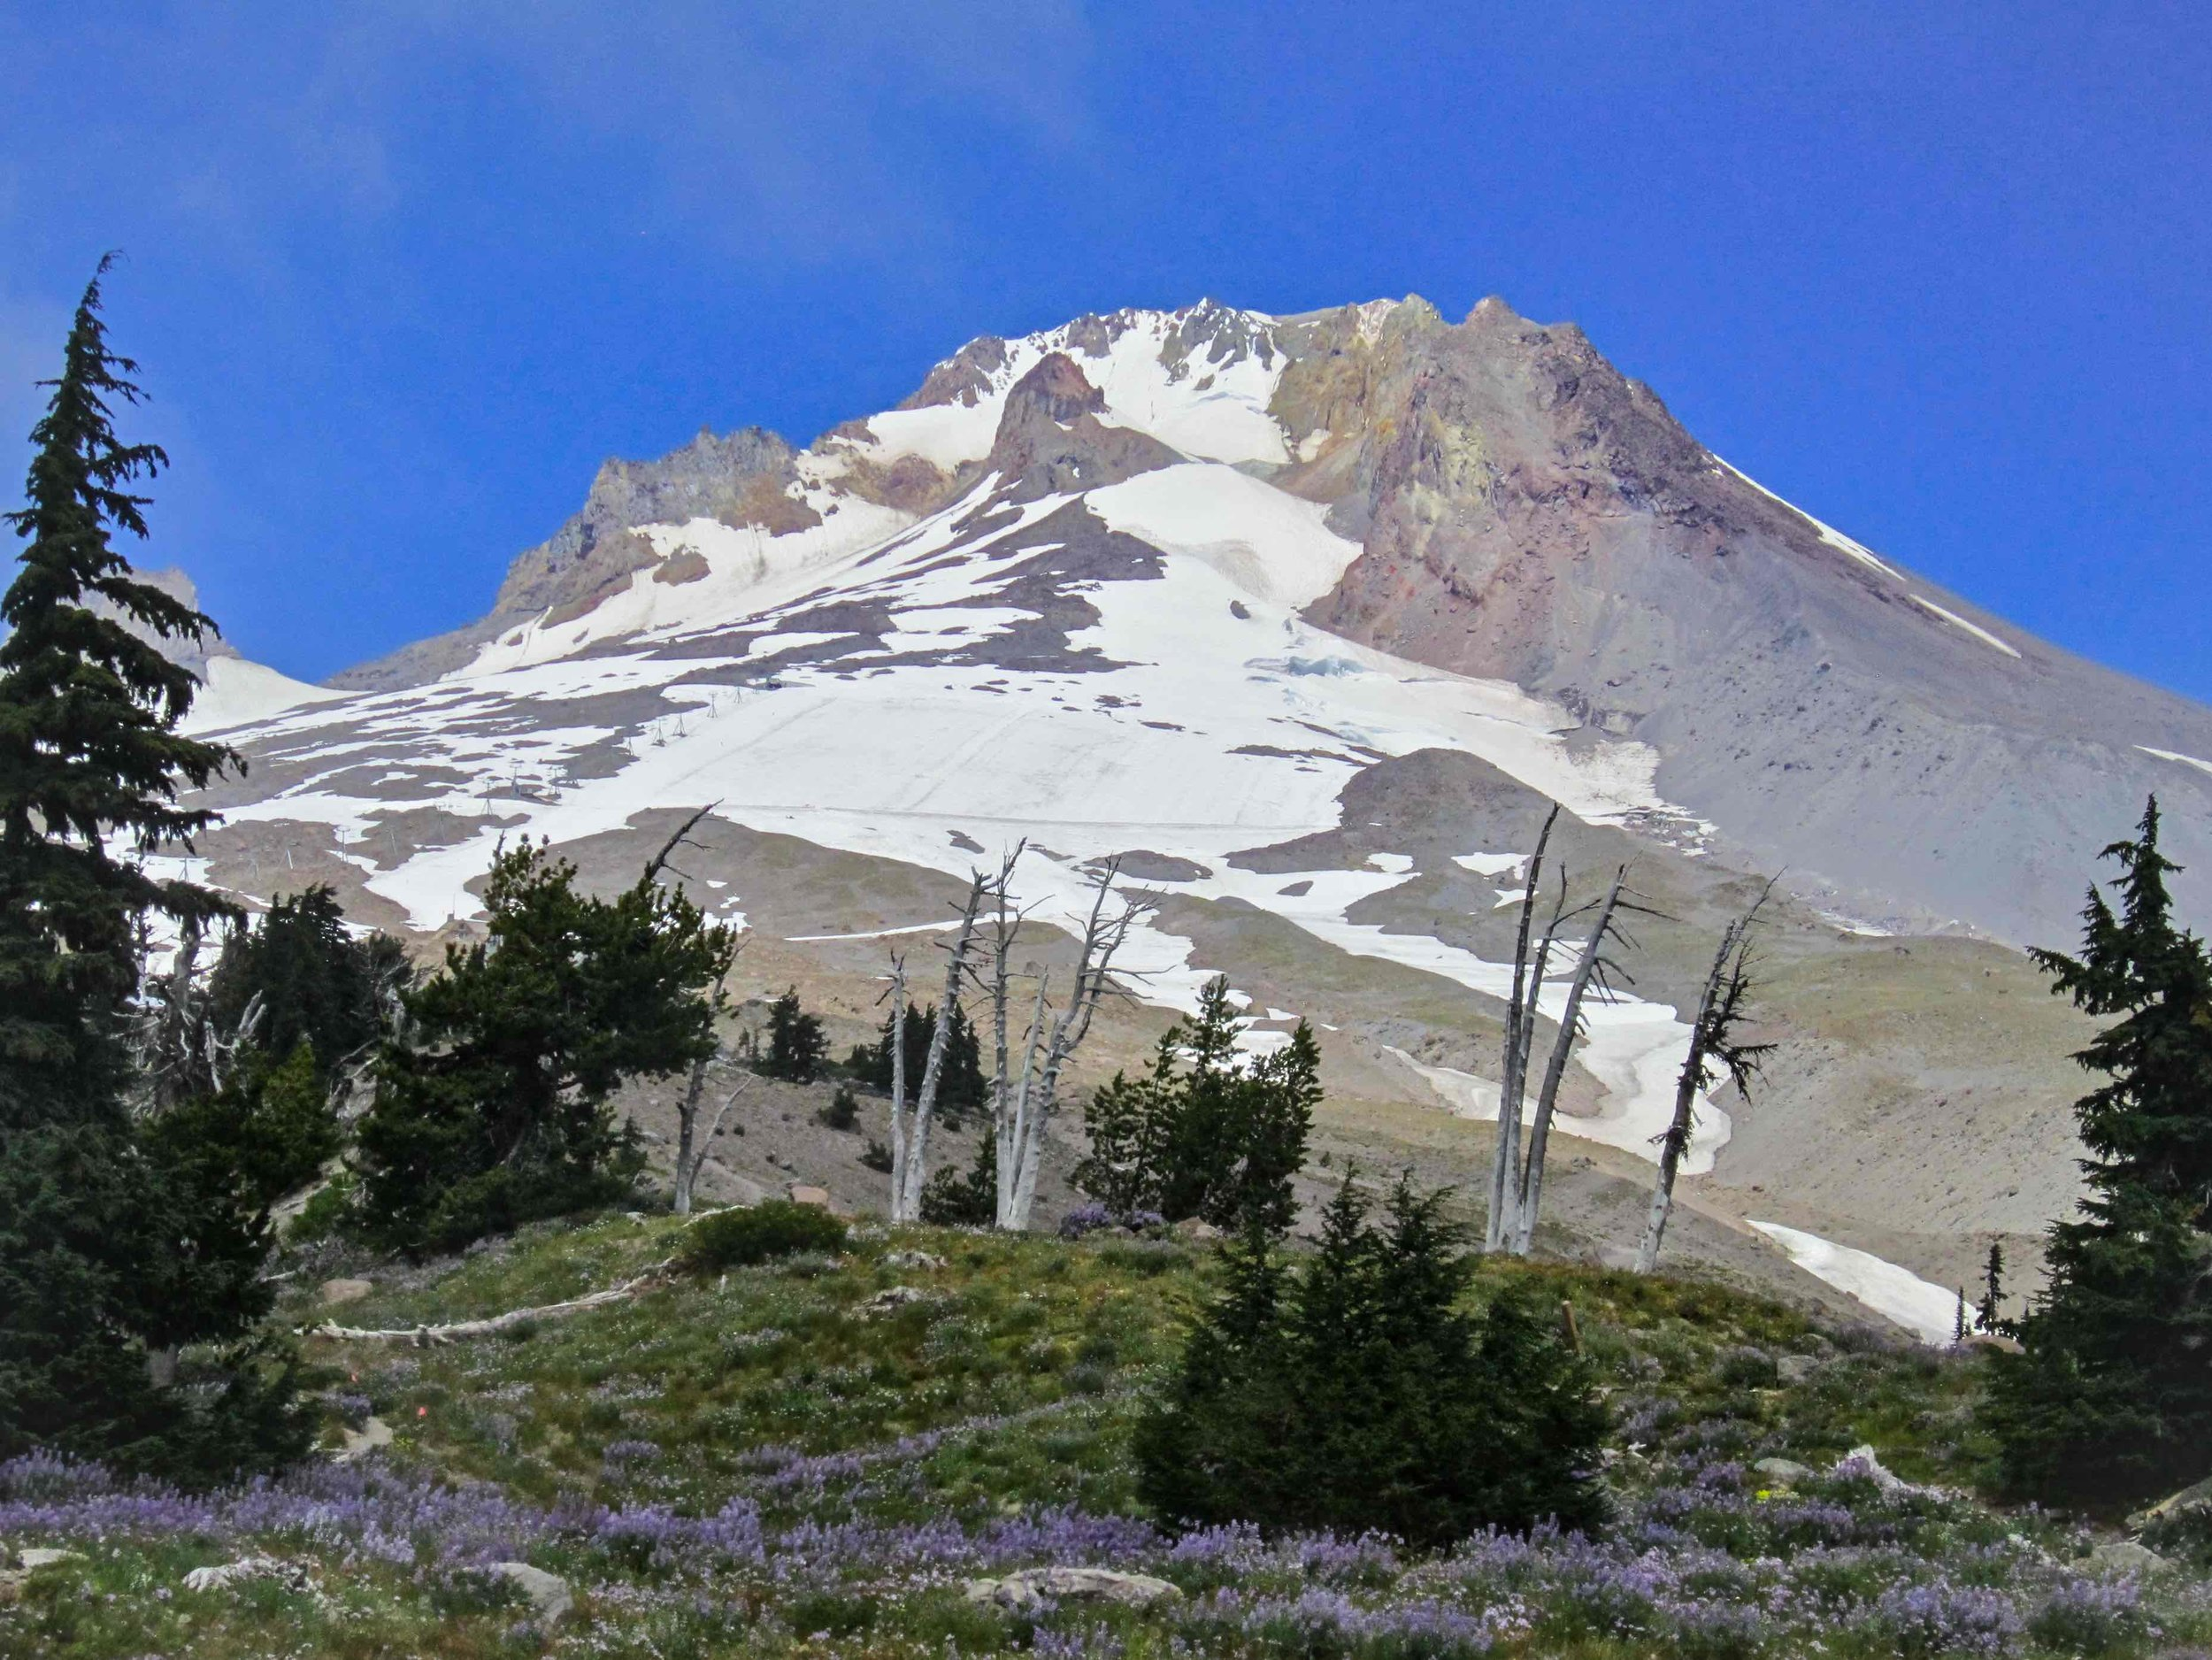 Wild Flowers emerge below Mount Hood, Oregon